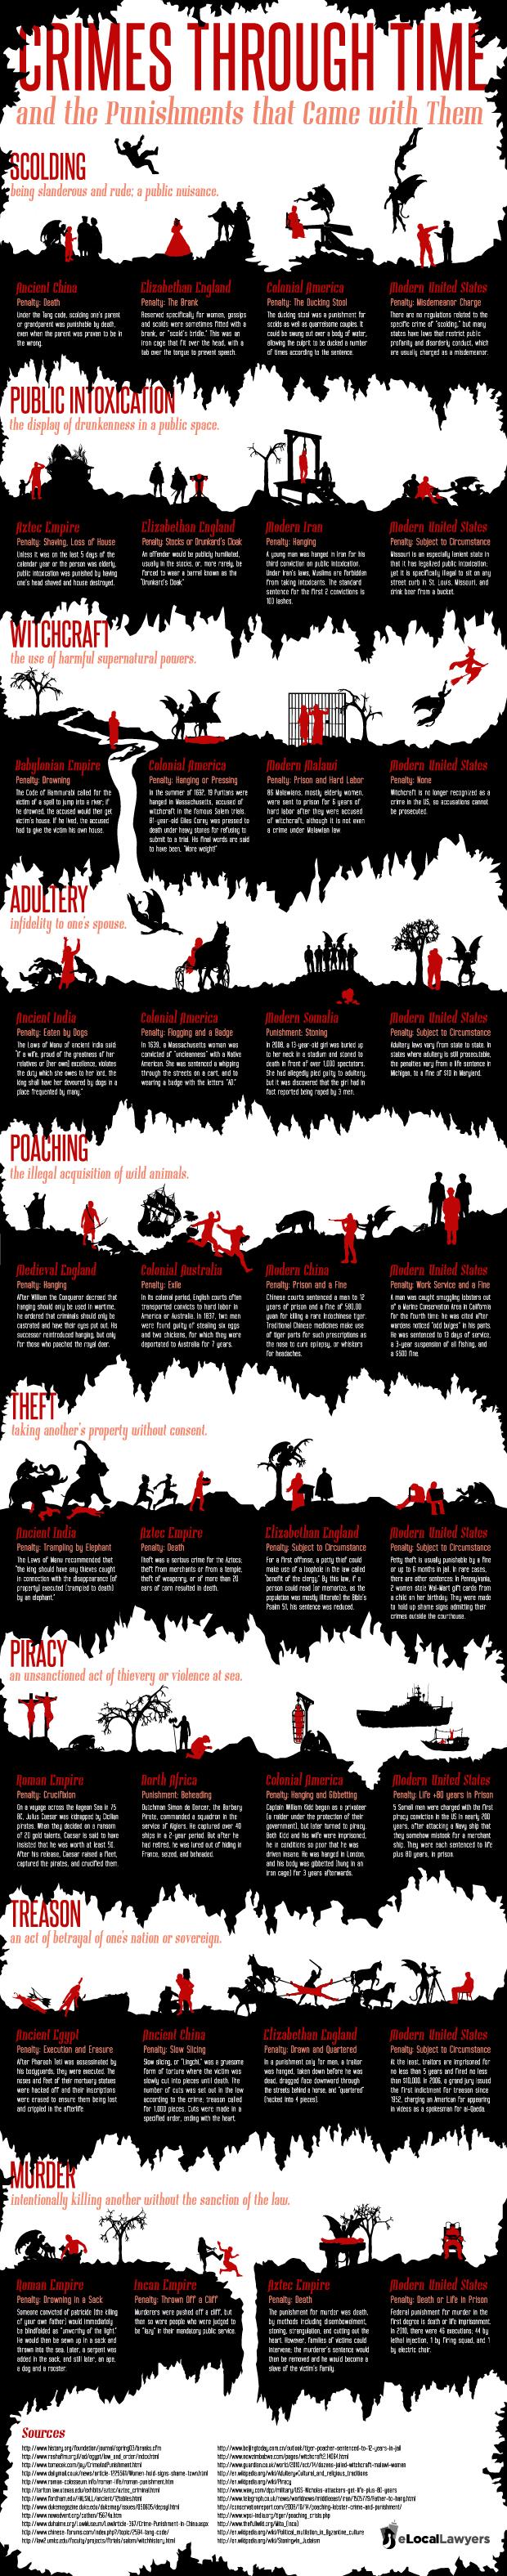 Crimes Through Time Infographic